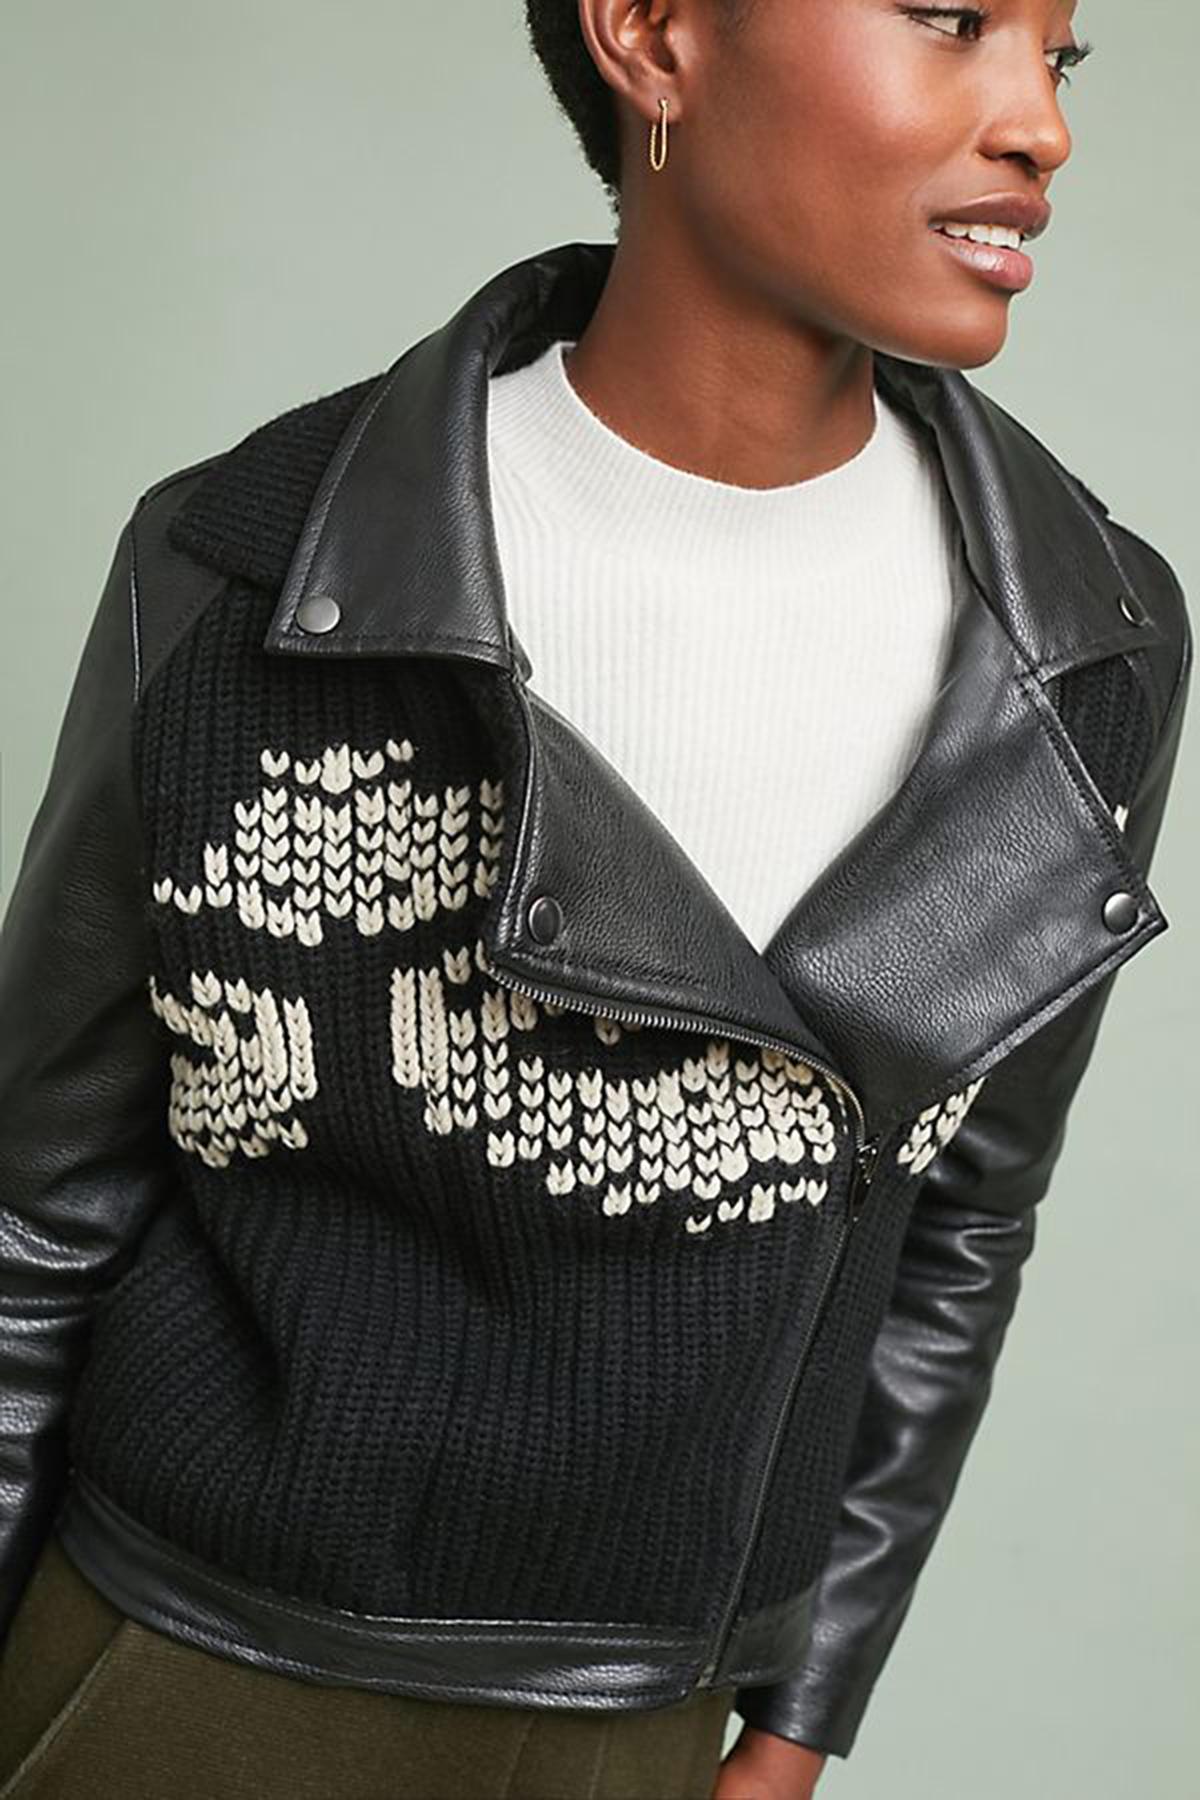 Sweater Moto Jacket Closeup